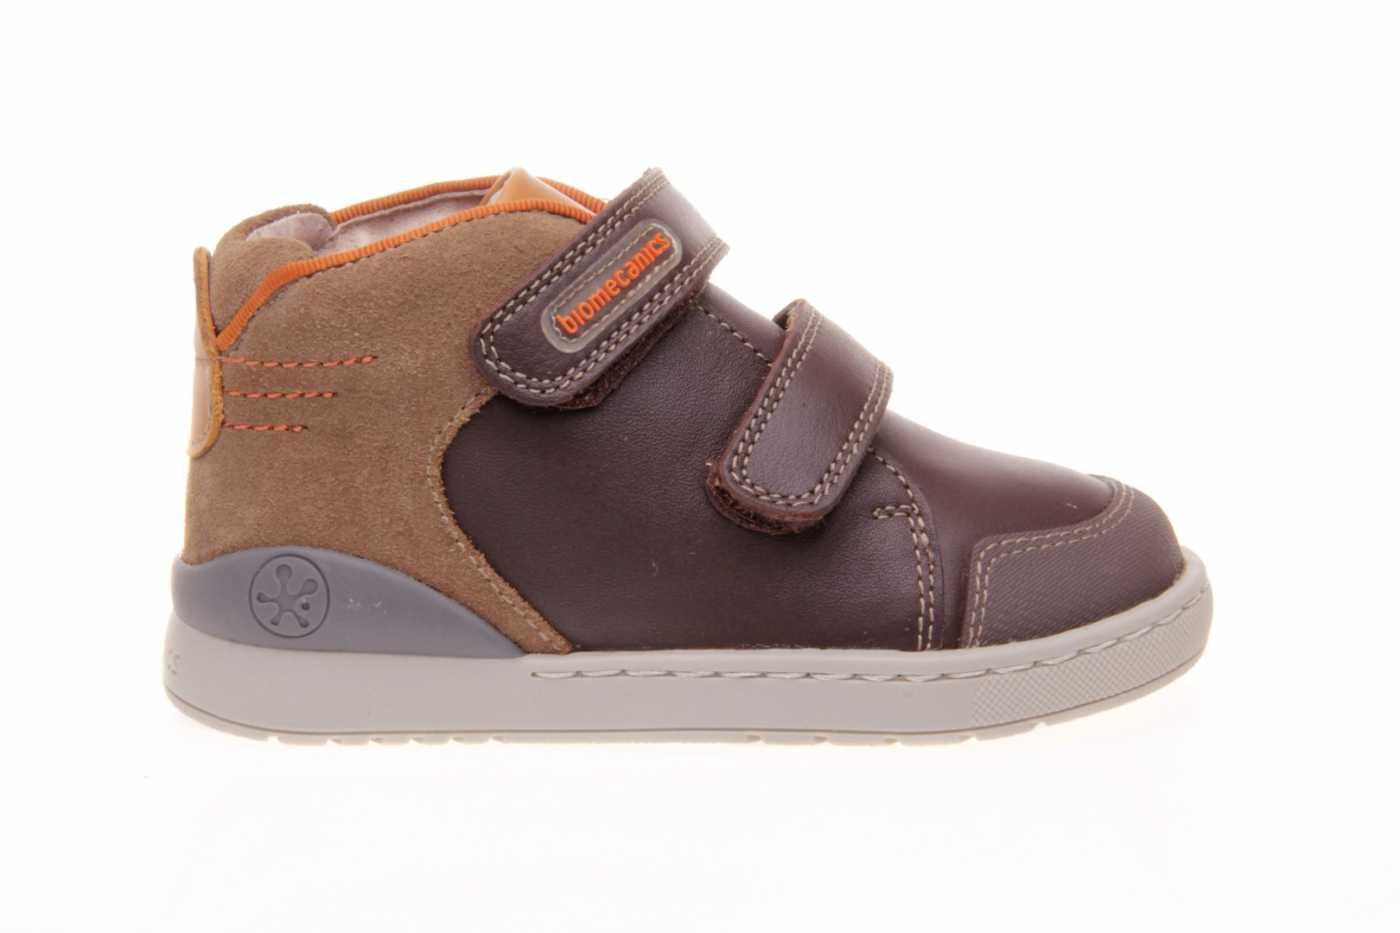 Edredón escucho música pómulo  Comprar zapato BIOMECANICS para JOVEN NIÑO estilo BOTAS color CAMEL PIEL